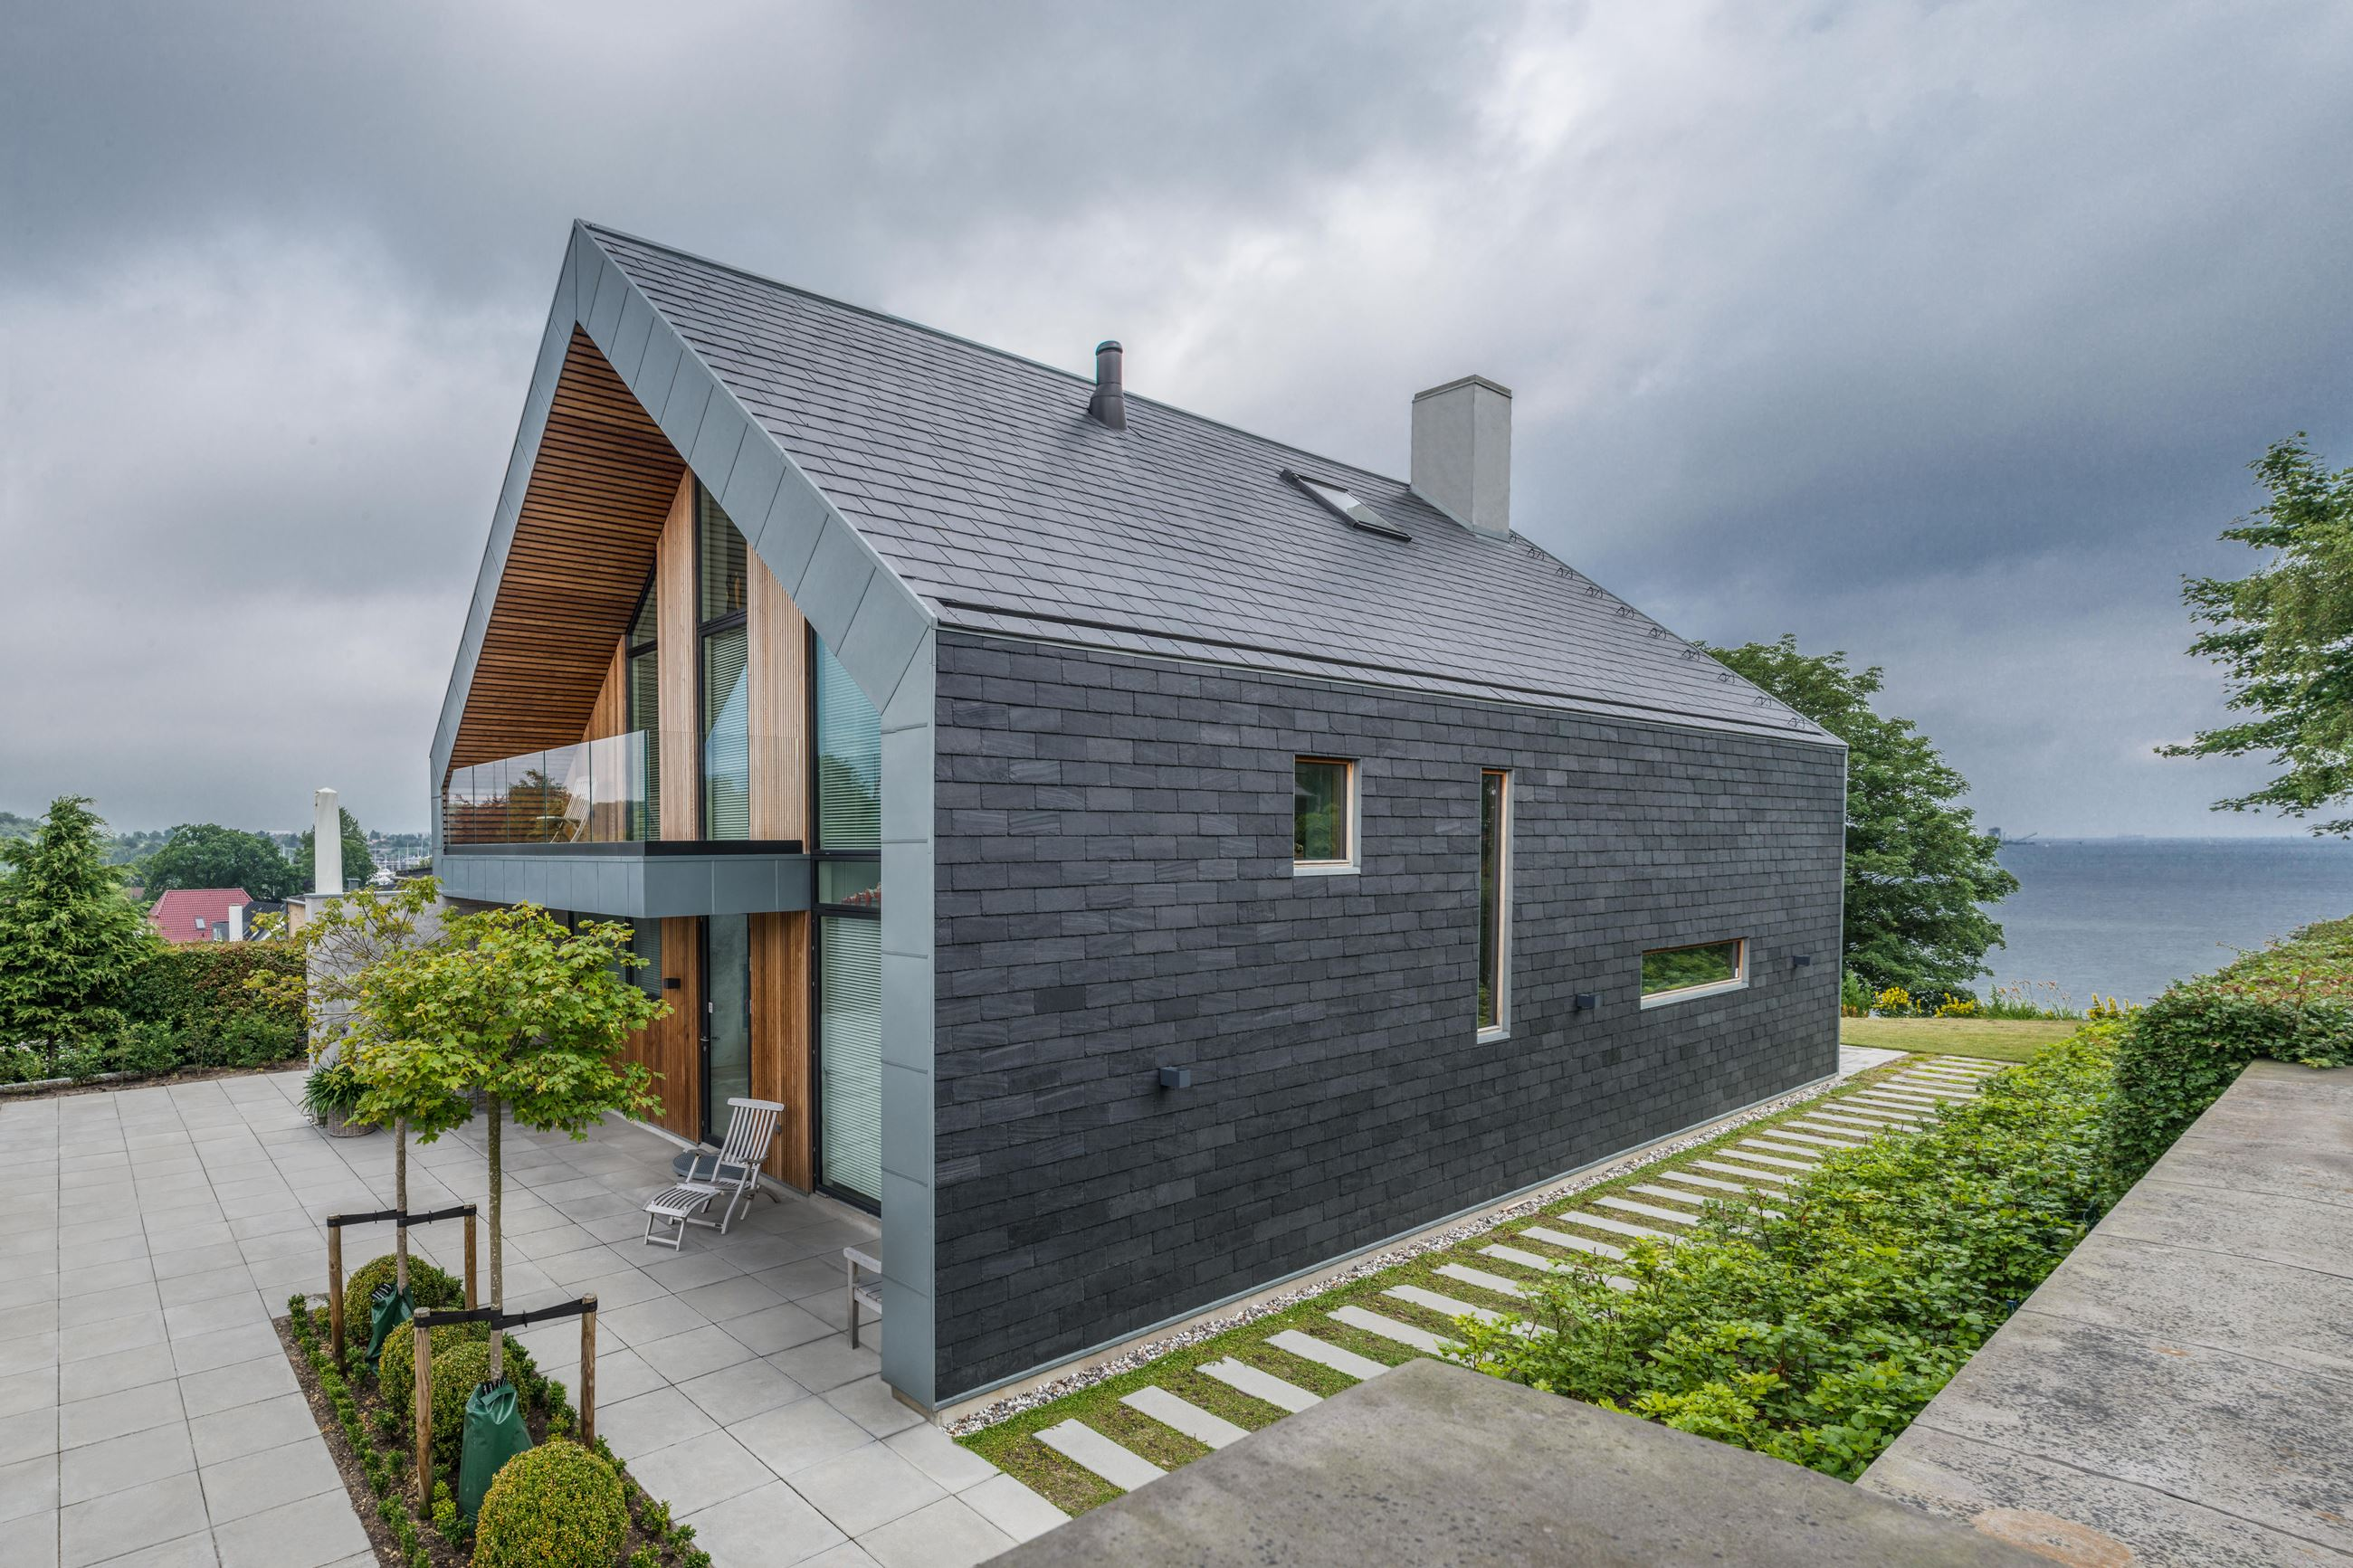 villa p cupa pizarras archello. Black Bedroom Furniture Sets. Home Design Ideas